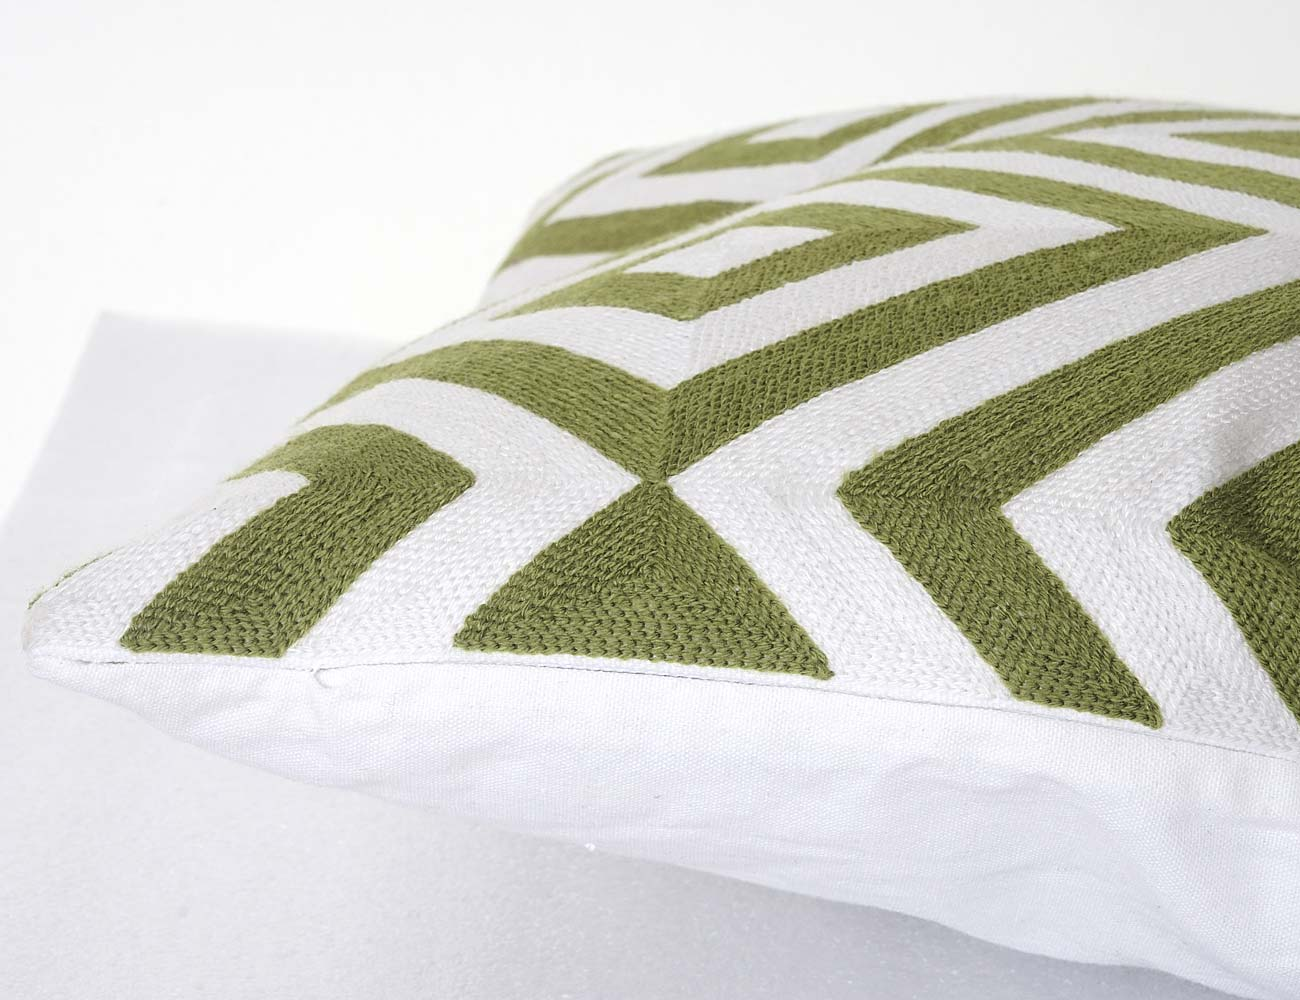 kissen deko sofakissen perfect kissenhlle x cm mundala brokat dekokissen sofakissen kissenbezug. Black Bedroom Furniture Sets. Home Design Ideas